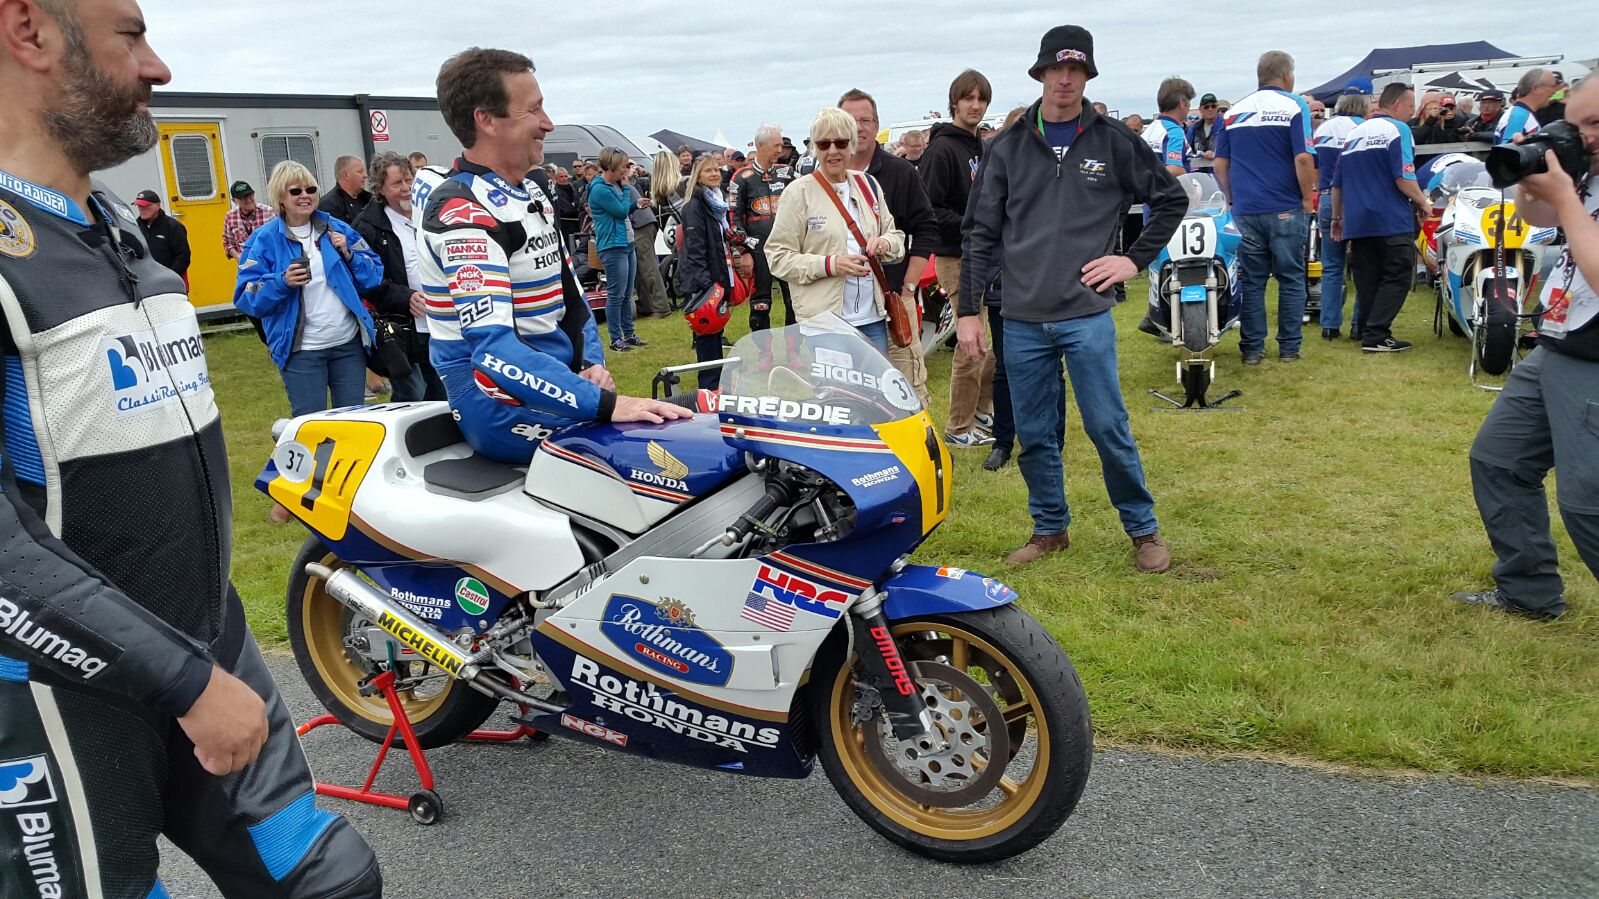 Classic TT 2019 at the Isle of Man